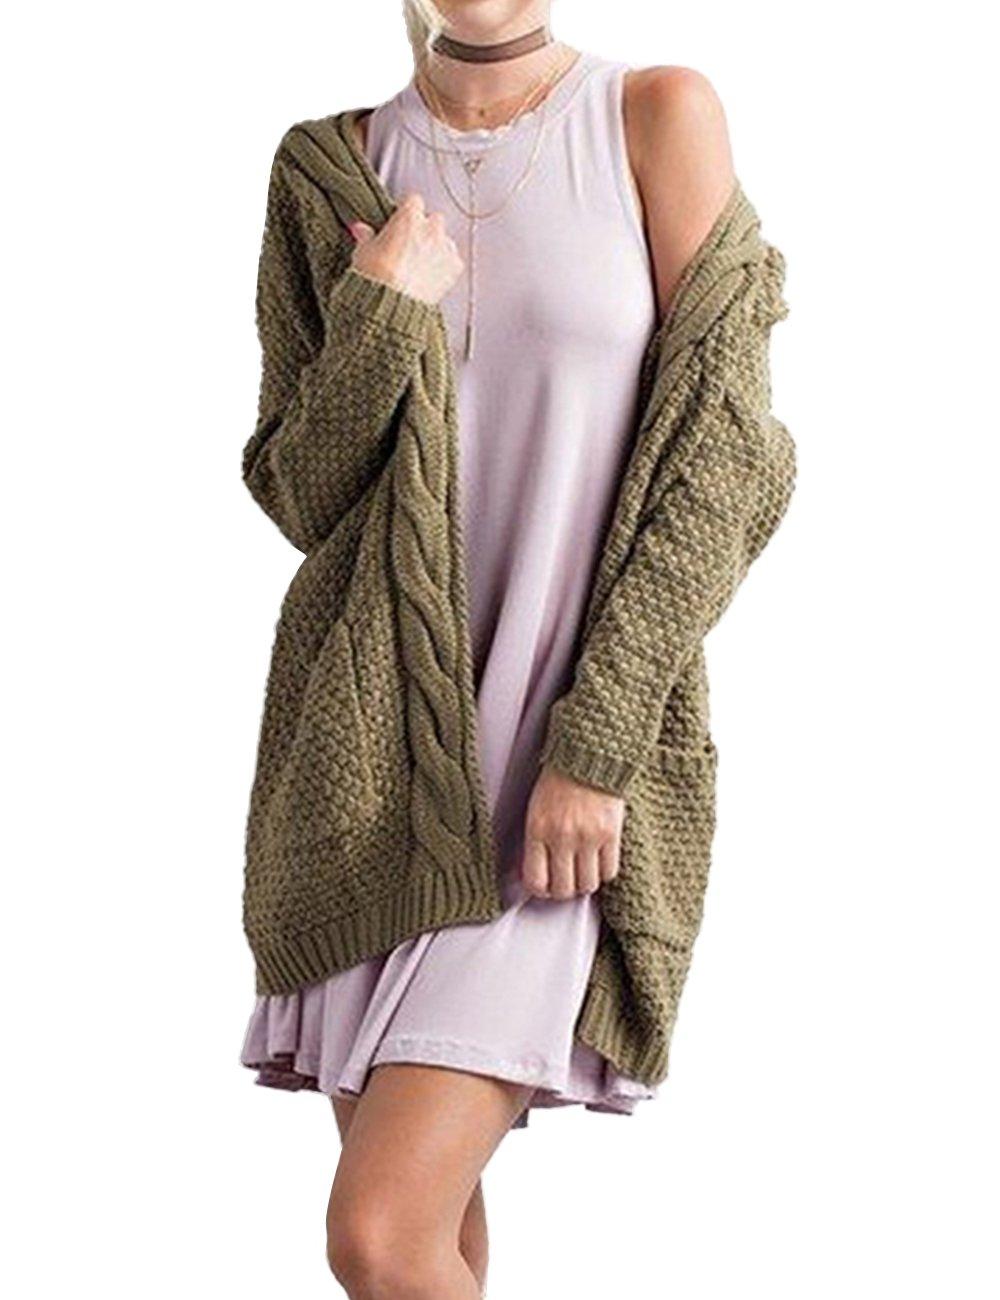 Xiakolaka Women's Long Sleeve Chunky Sweater Open Front Cable Knit Cardigans